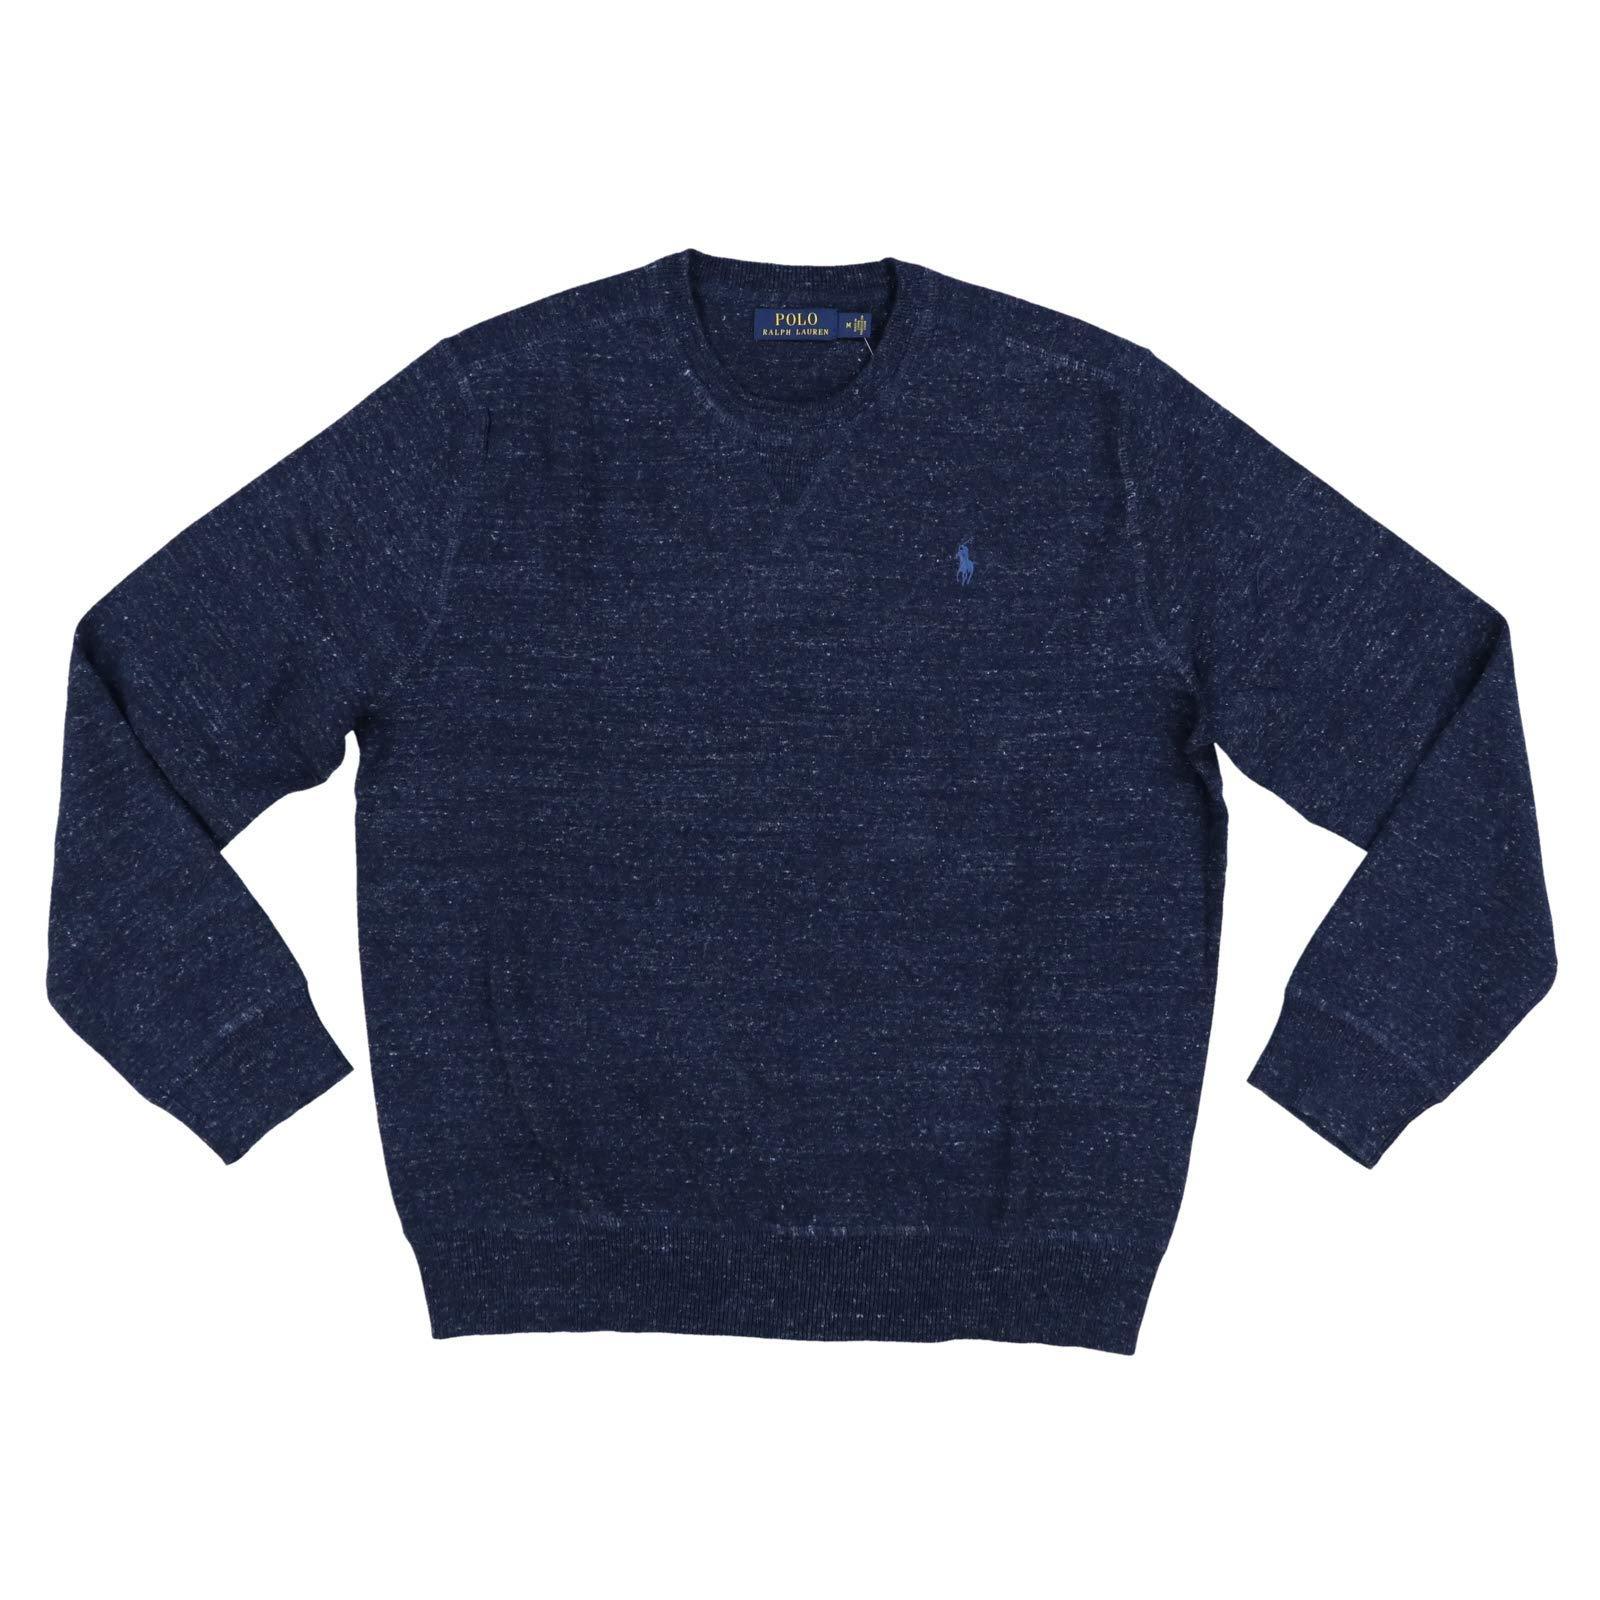 Polo Ralph Lauren Mens Crew Neck Pullover Sweater (Large, Navy Heather)